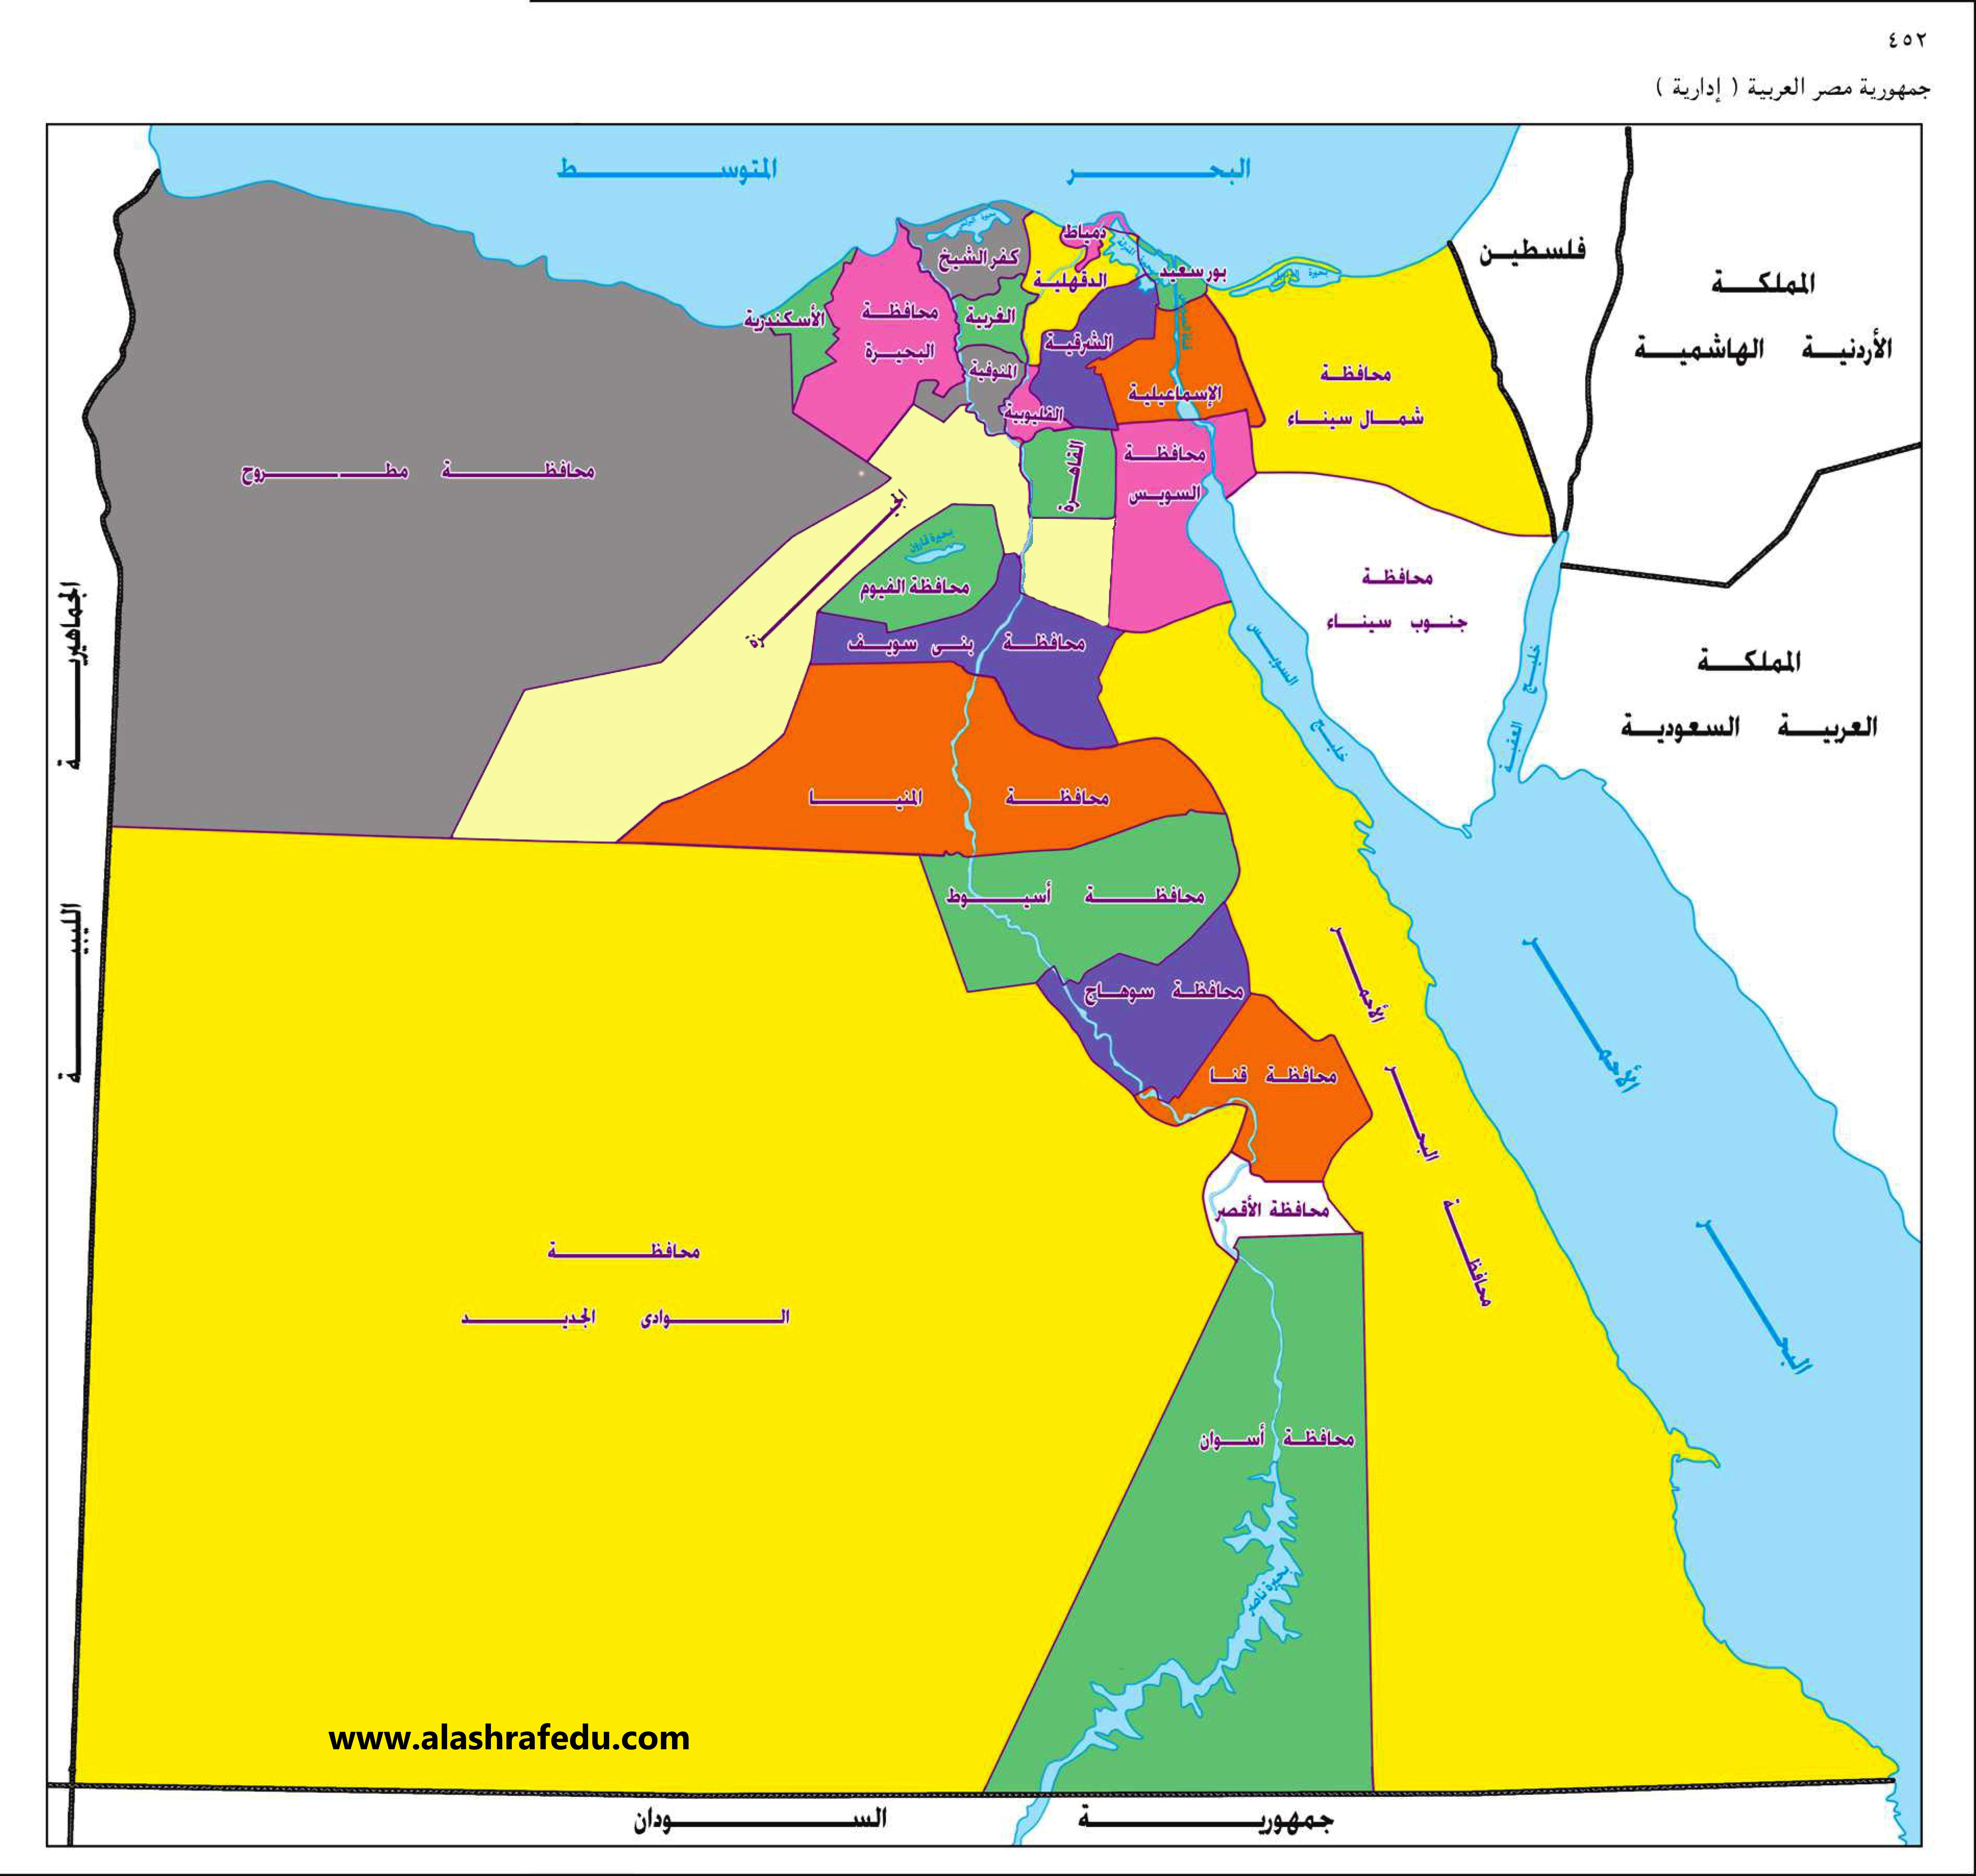 أطلس خرائط محافظات 2018 www.alashrafedu.com1